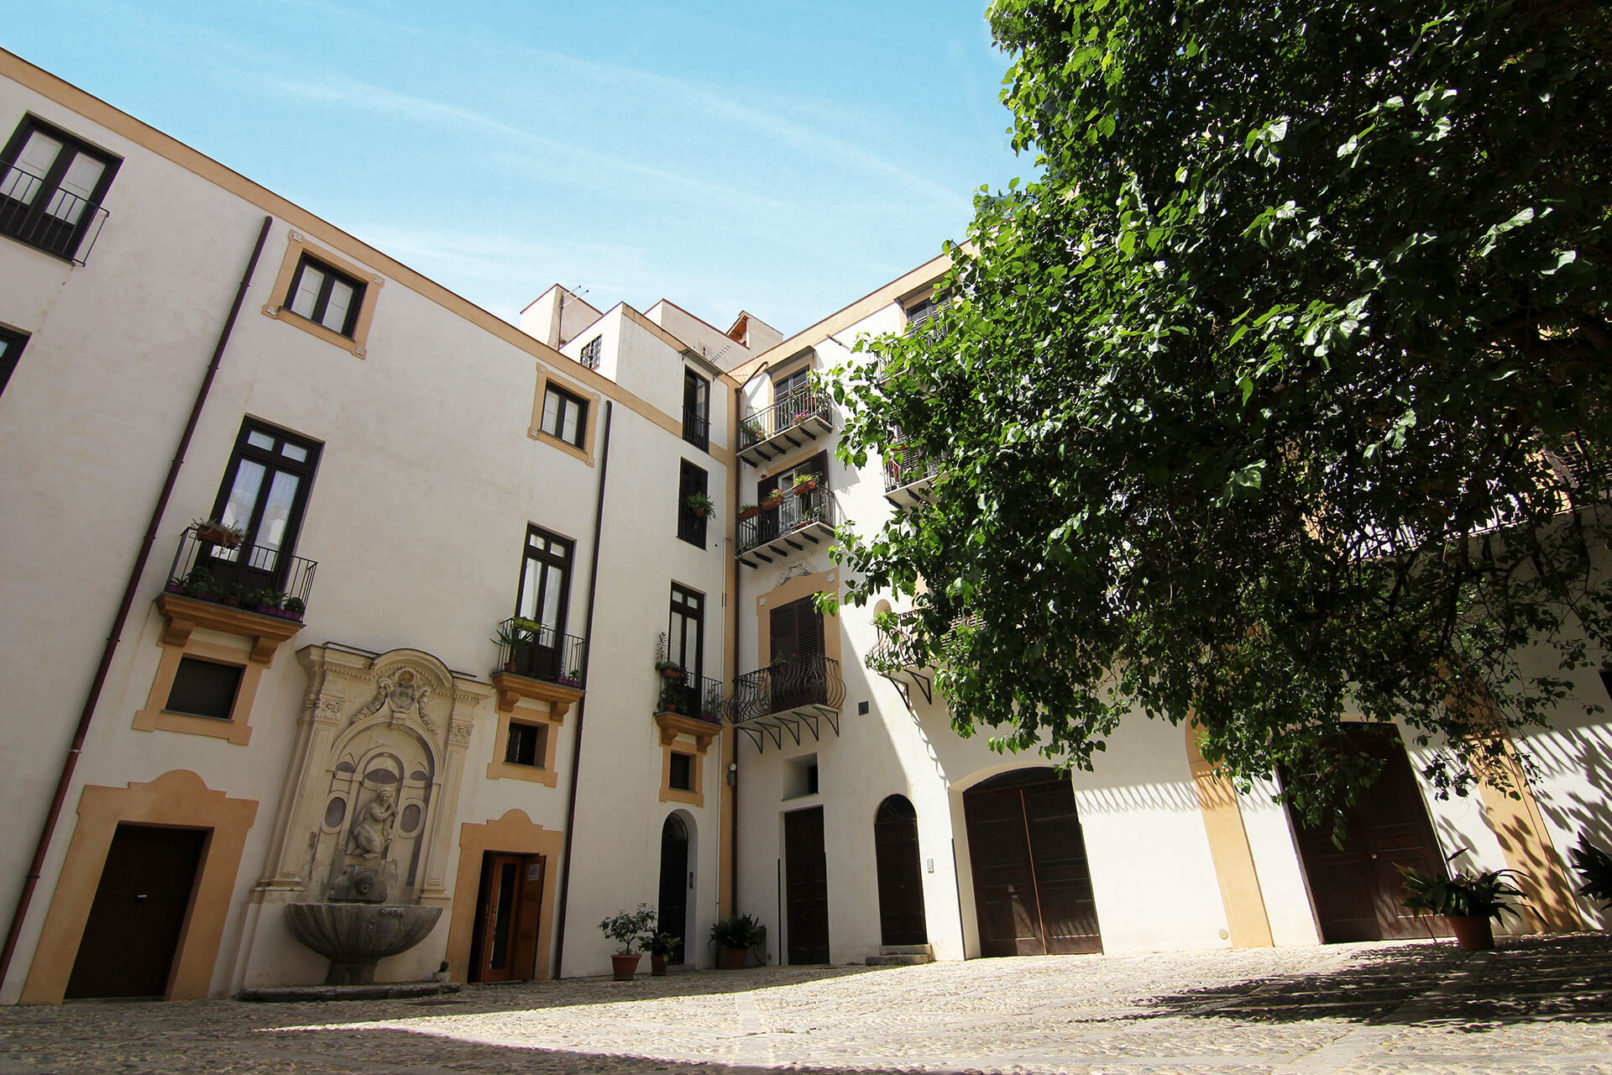 Palazzo Lungarini